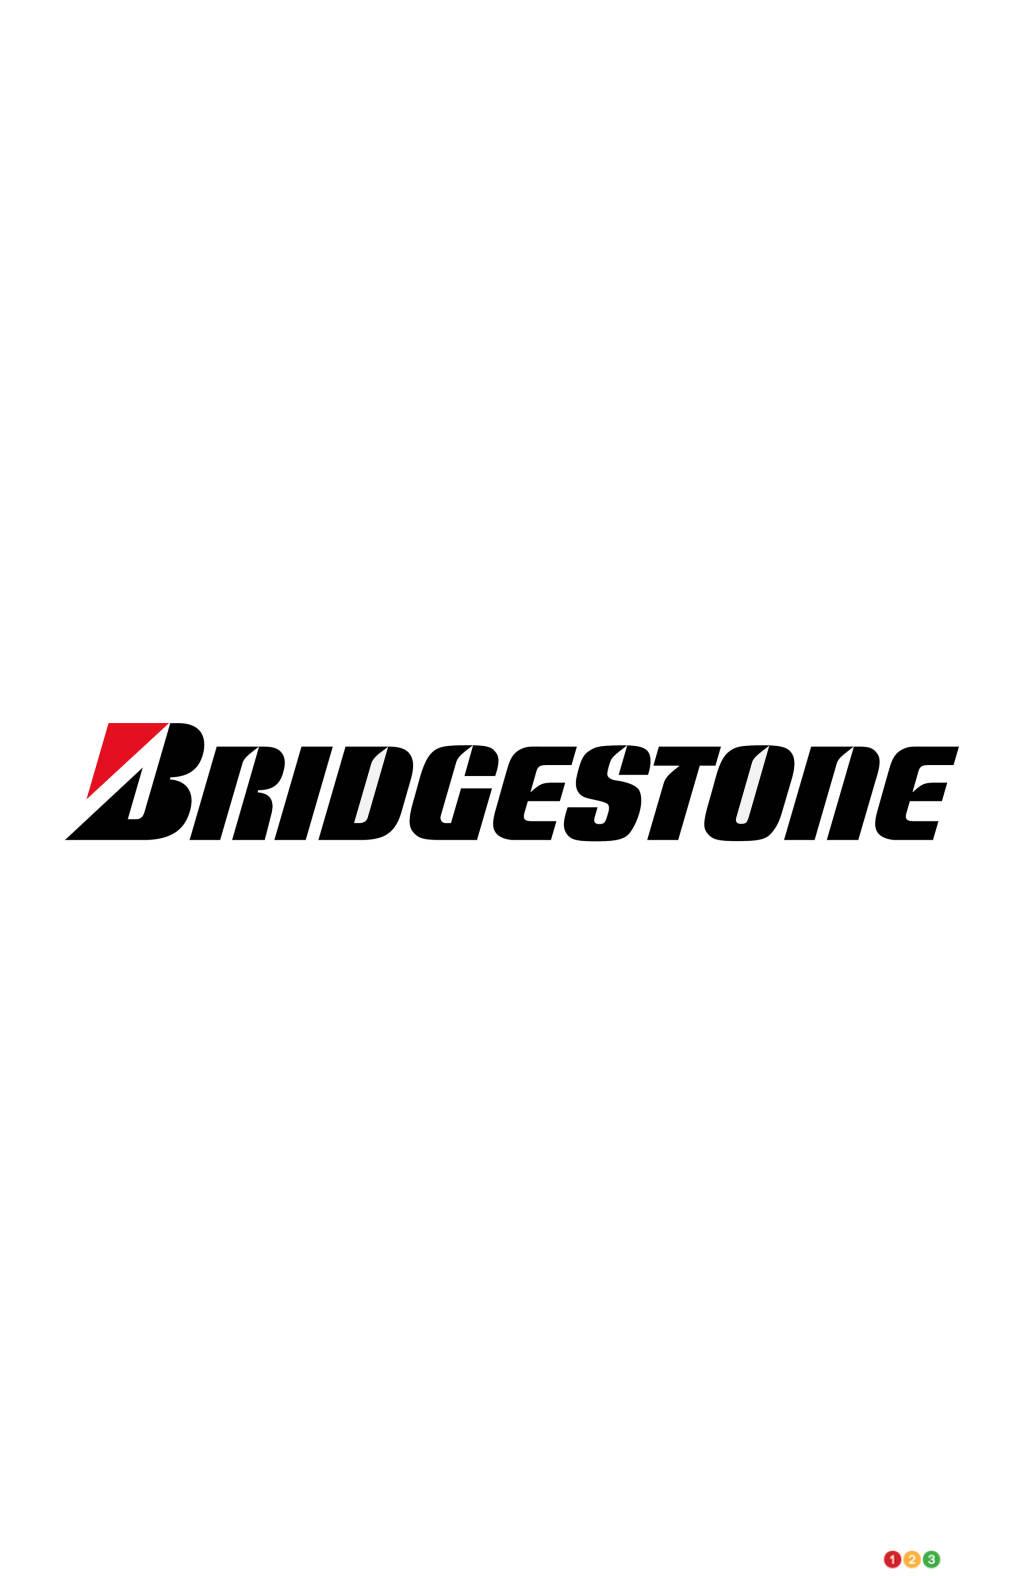 Articles On Bridgestone